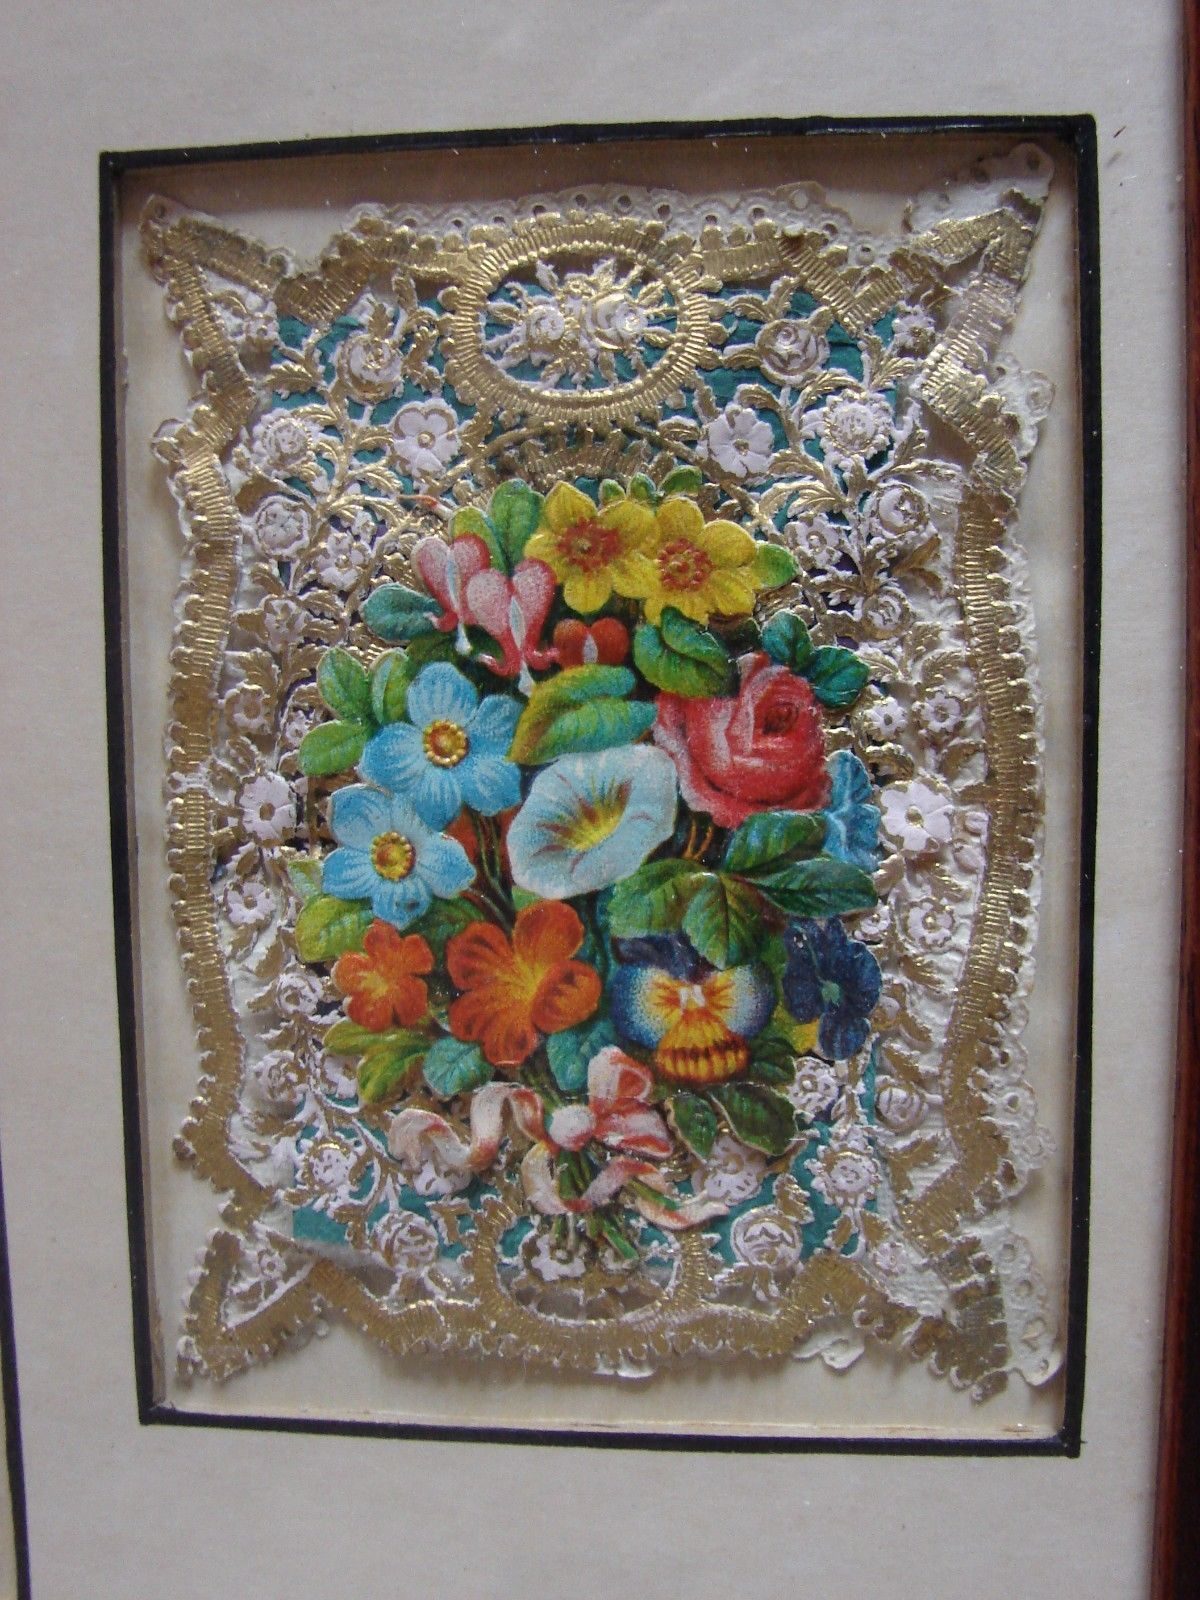 Antique valentines cards circa 1850 framed ebay